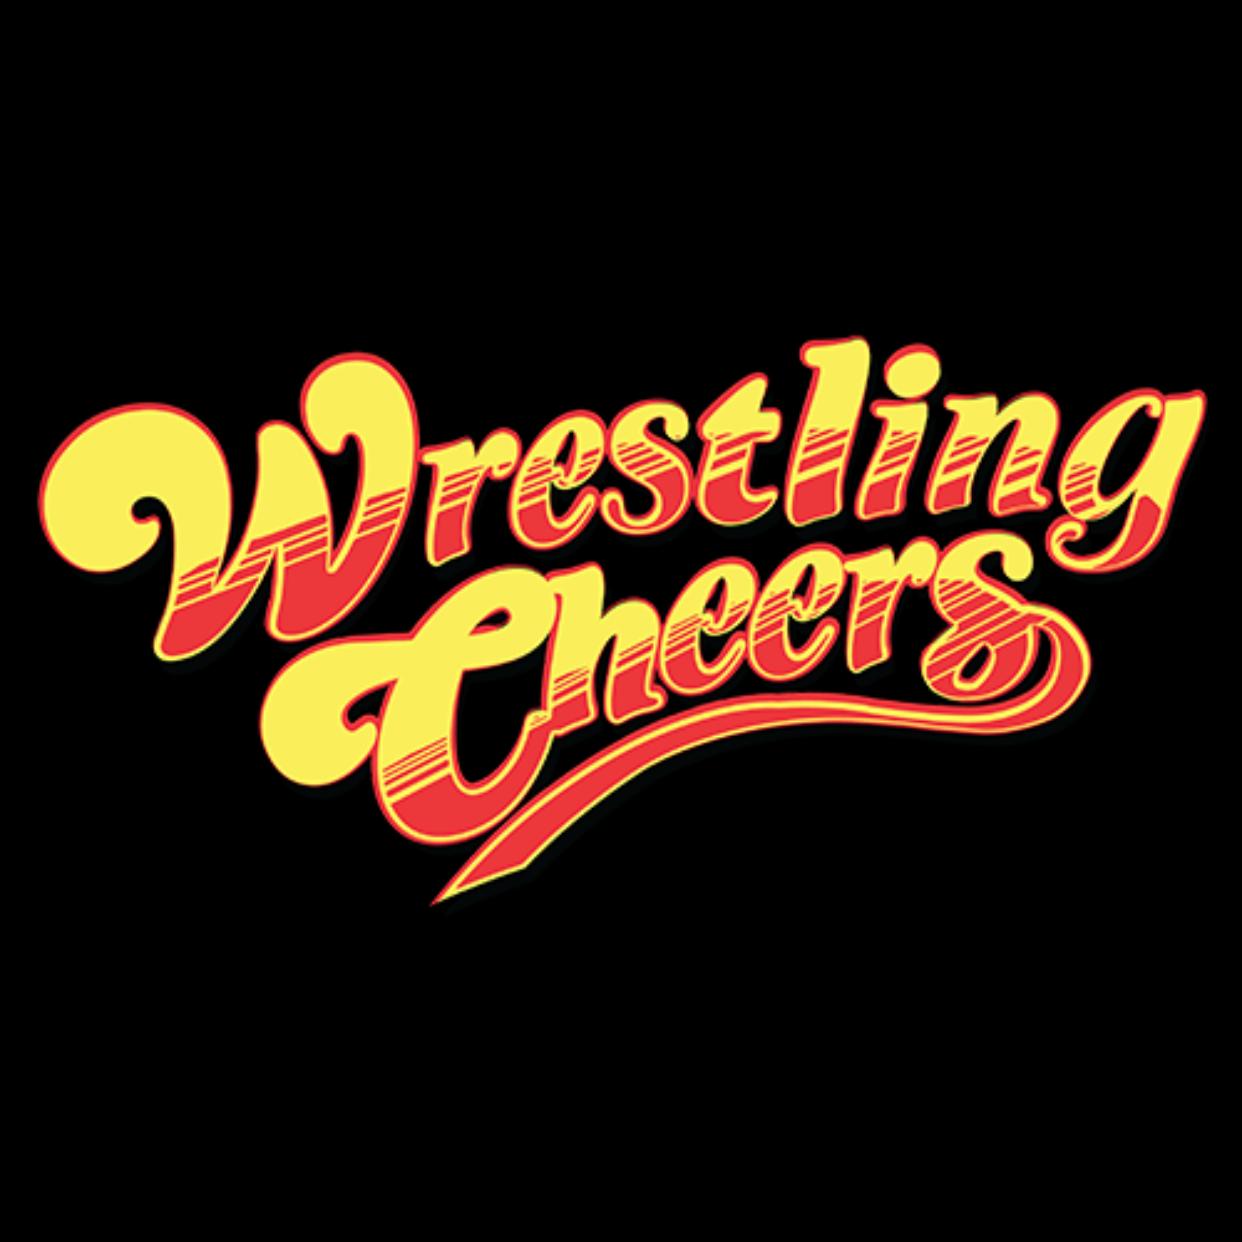 @WrestlingCheers Profile Image | Linktree